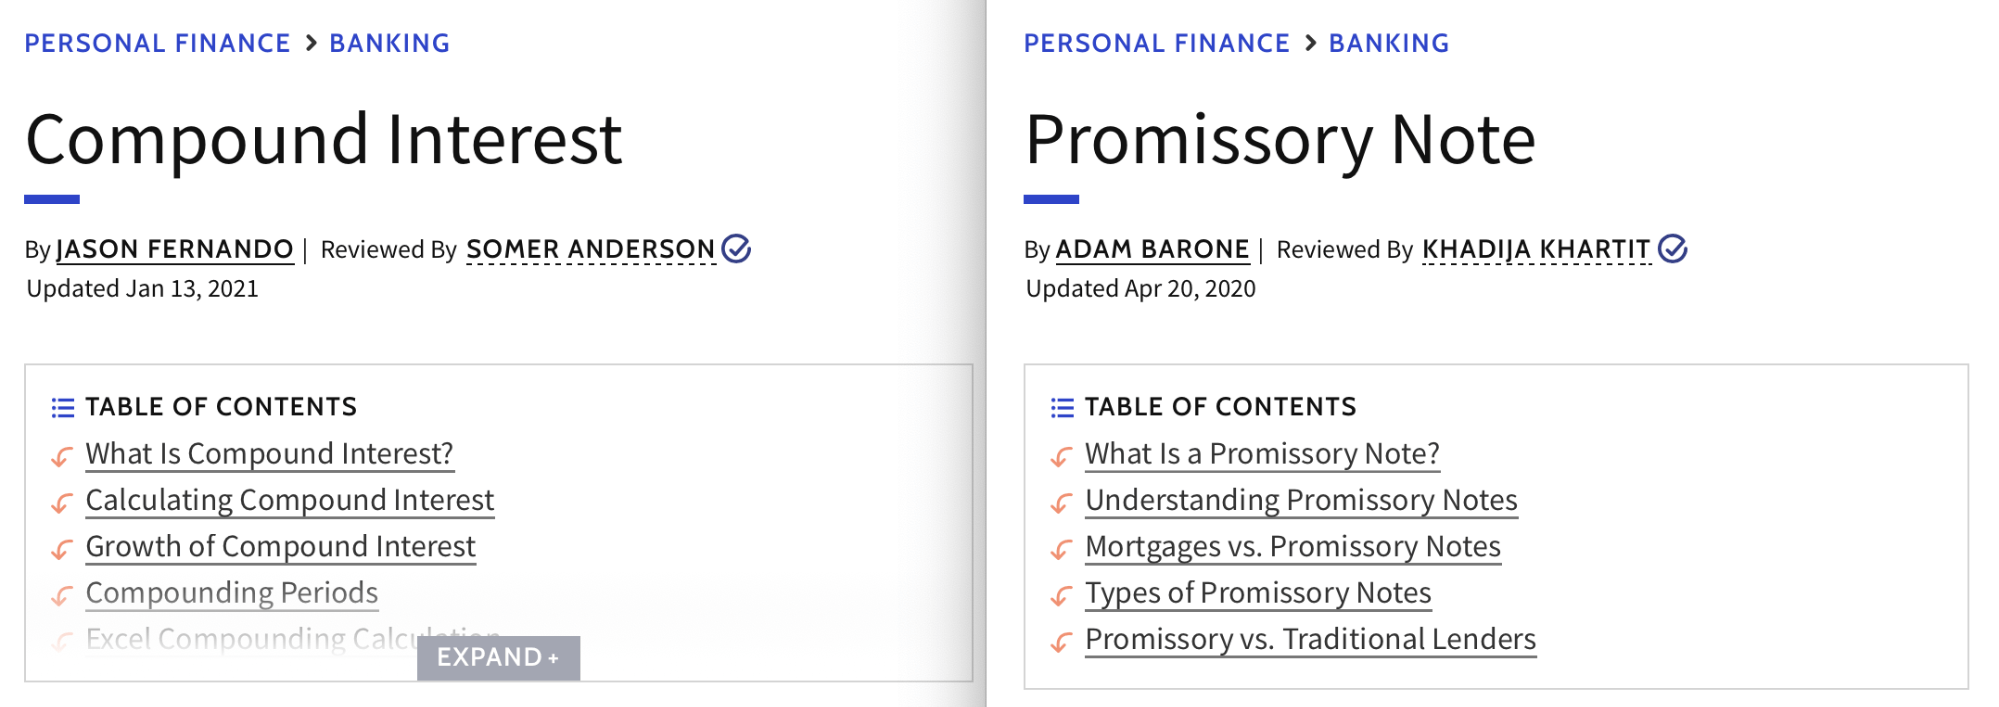 compound interest vs promissory note